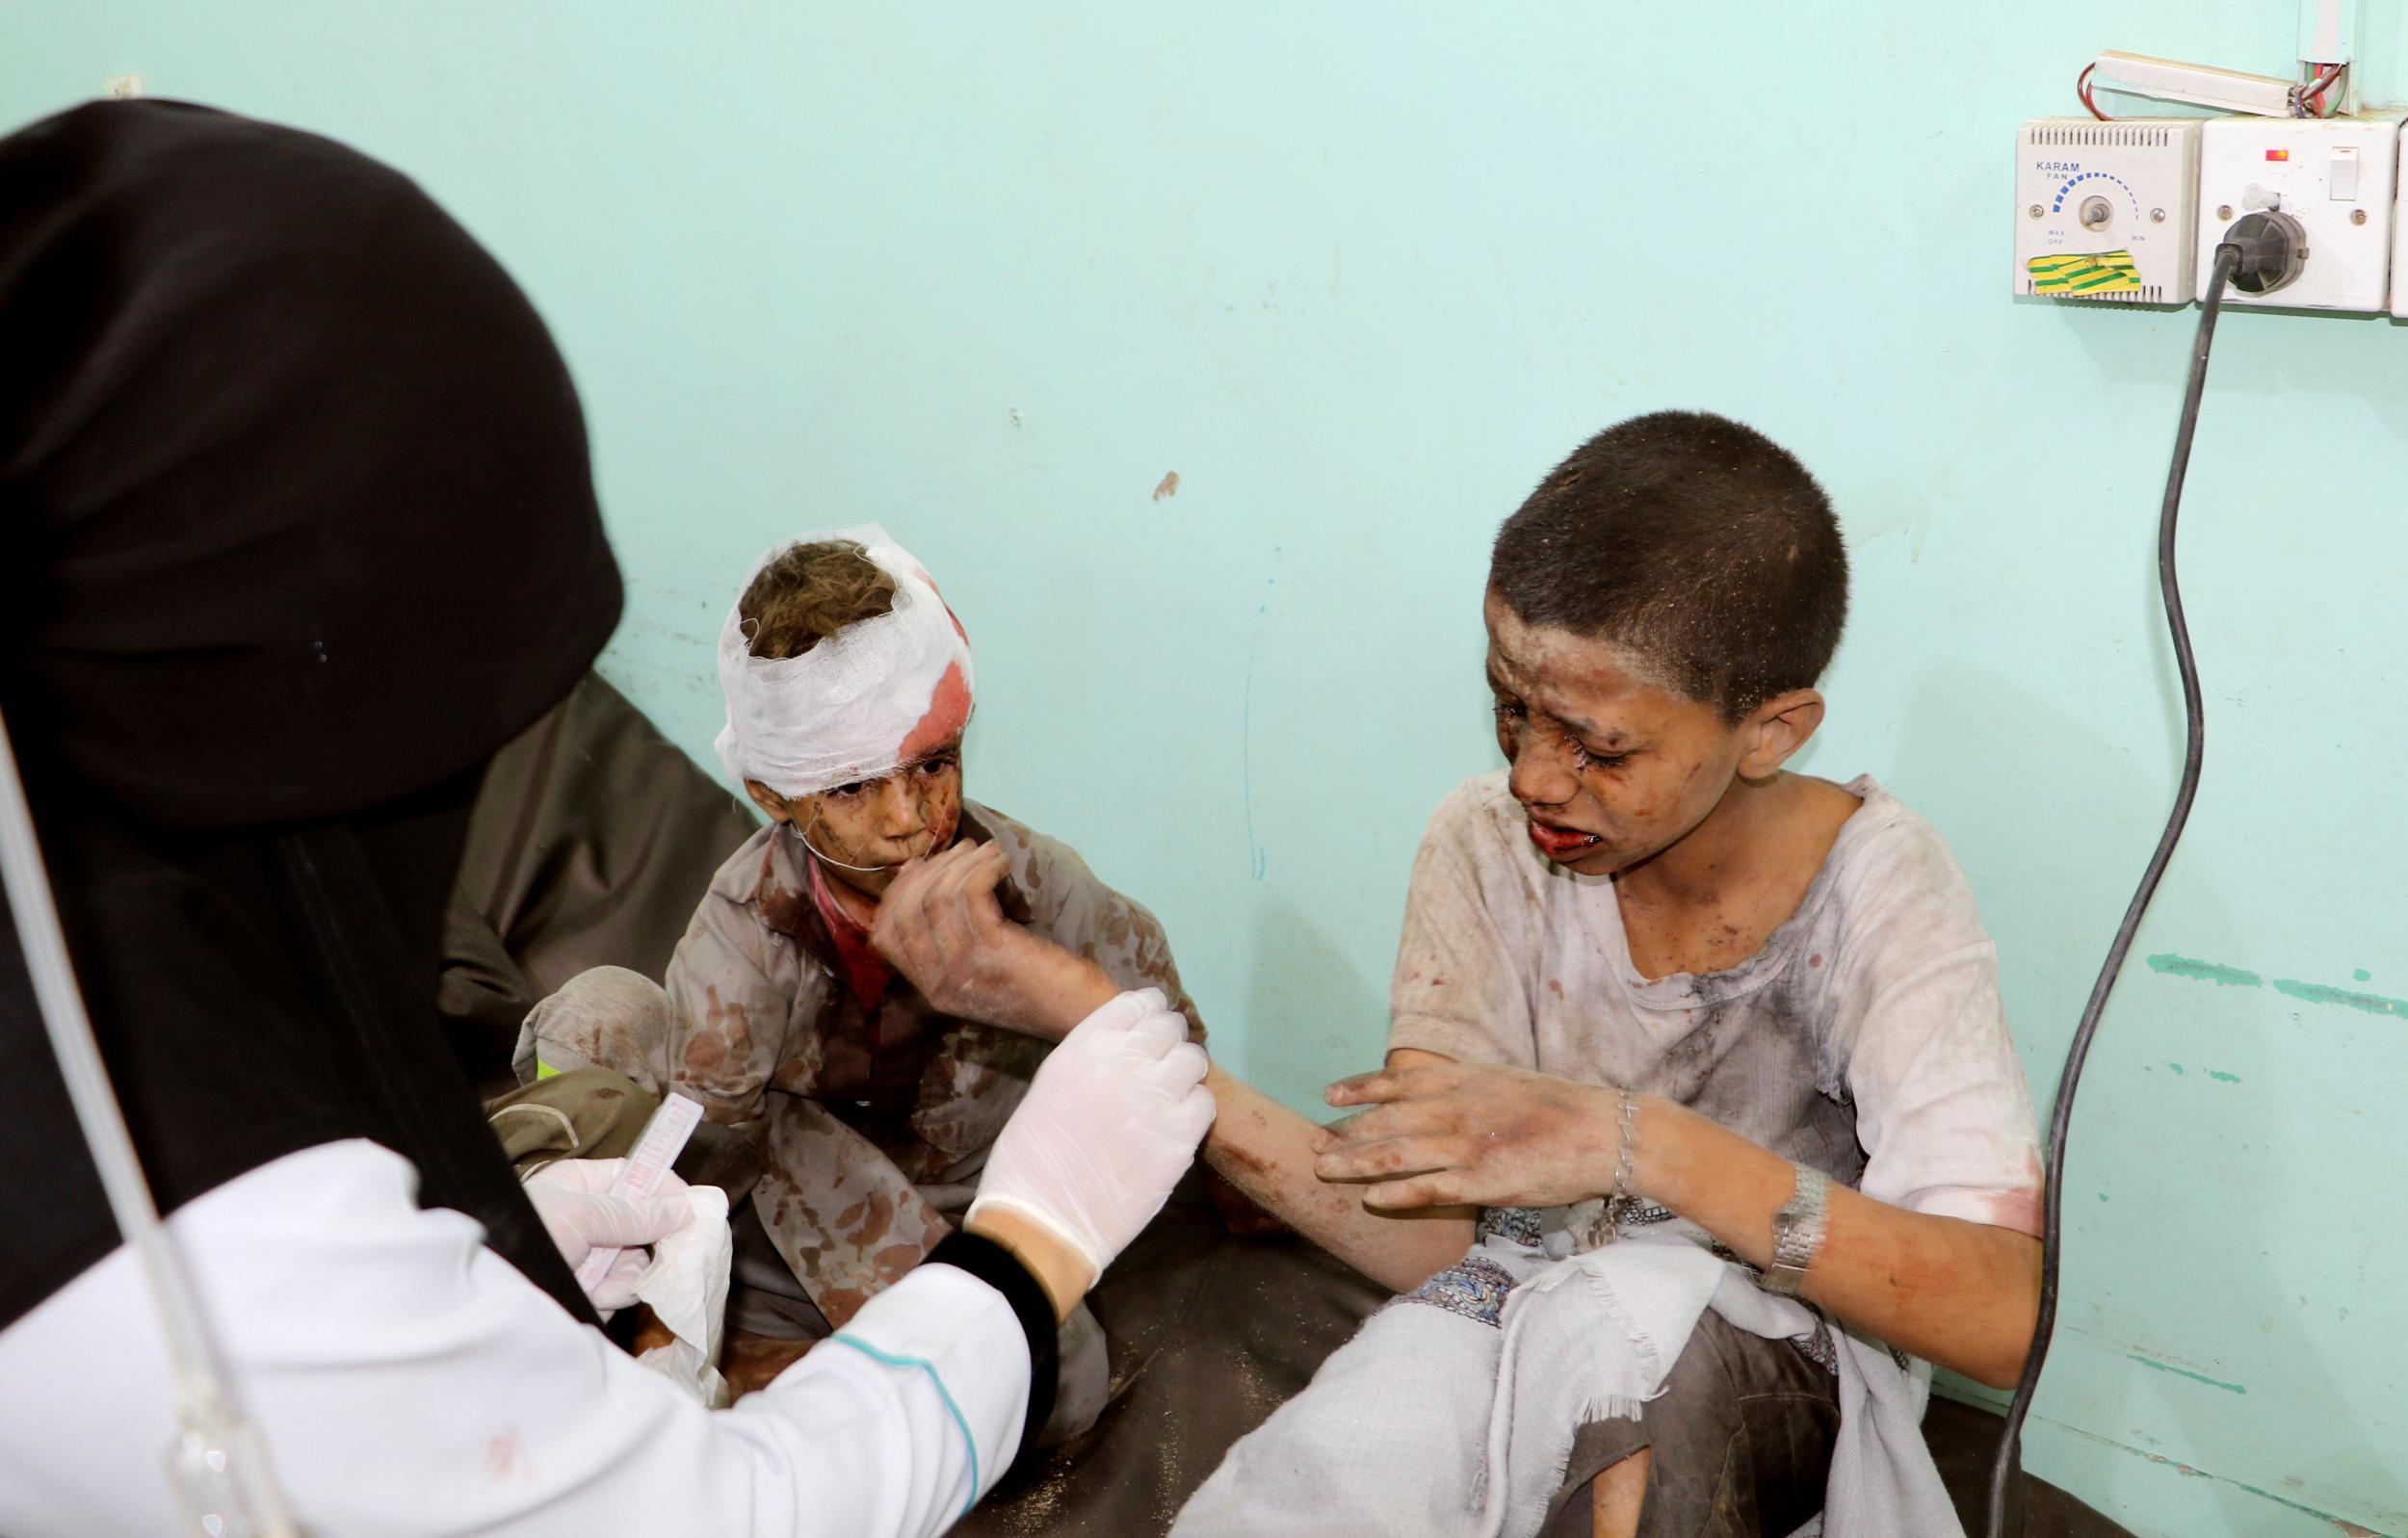 Saudi coalition airstrike hits school bus killing dozens of children in Yemen